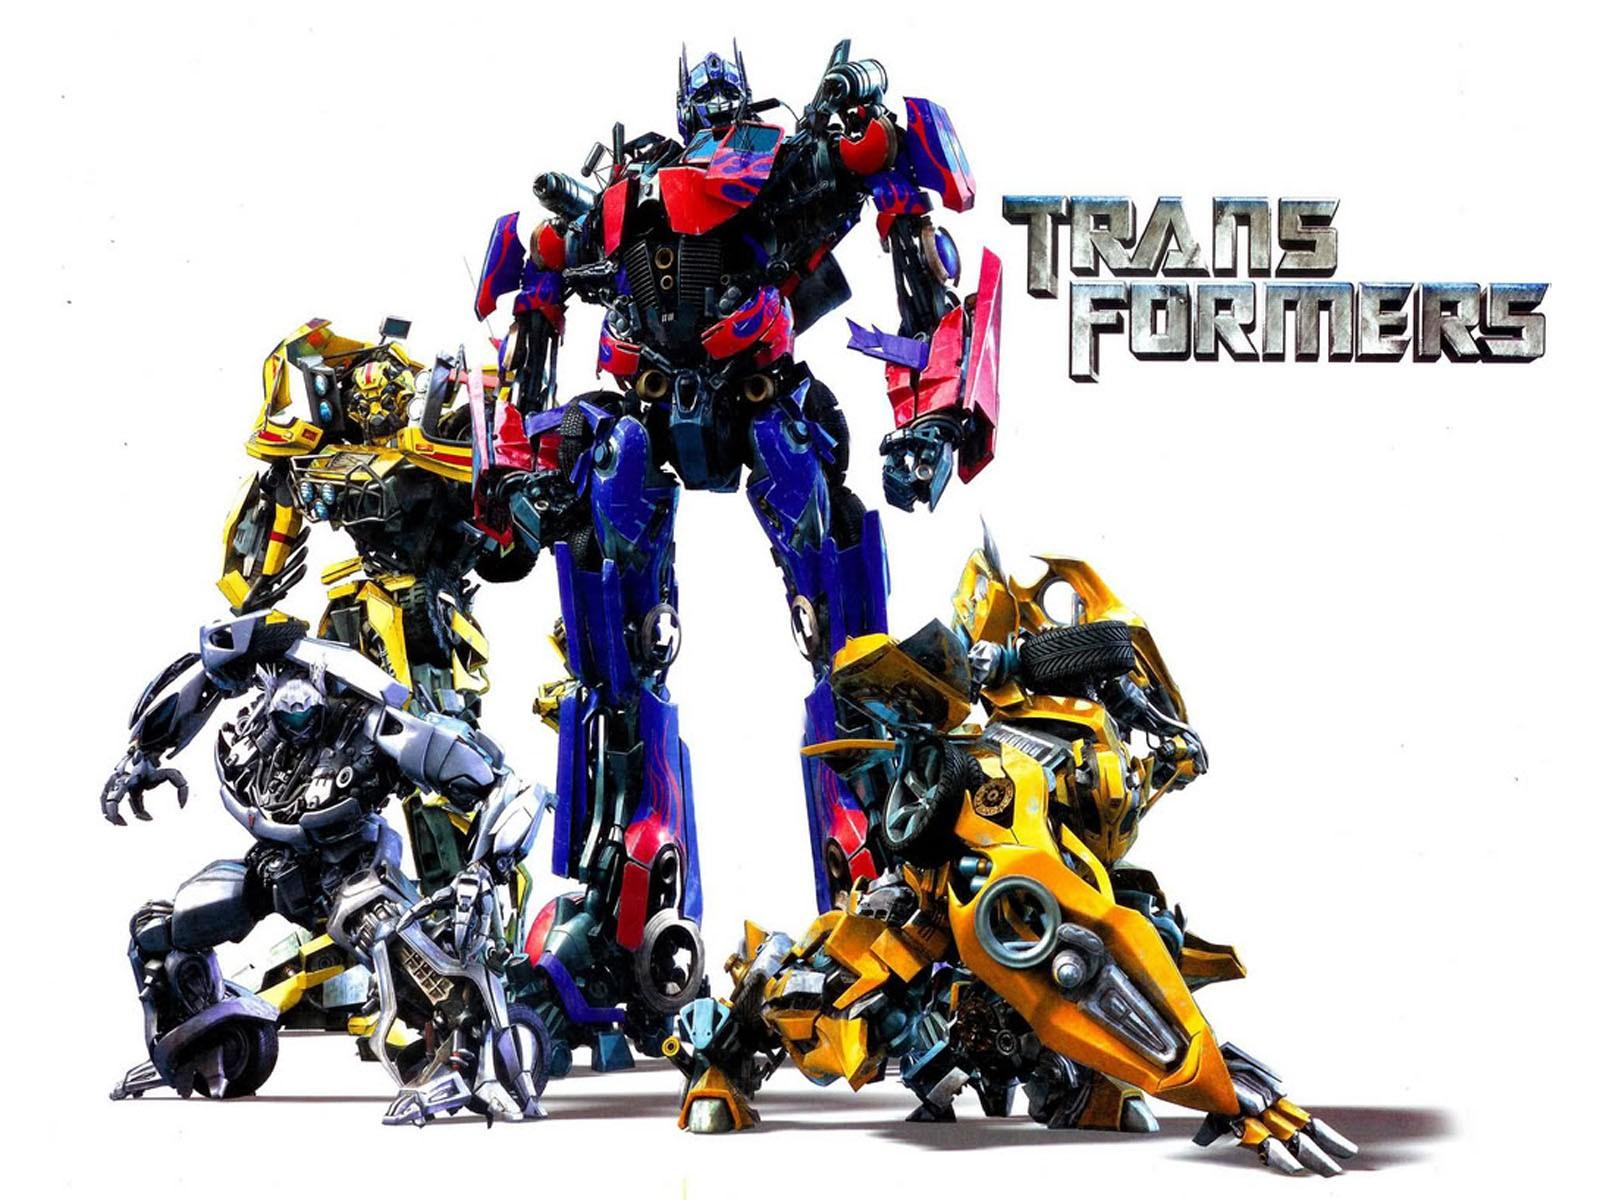 Transformers Autobots HD Wallpaper High Definition Wallpapers High 1600x1200